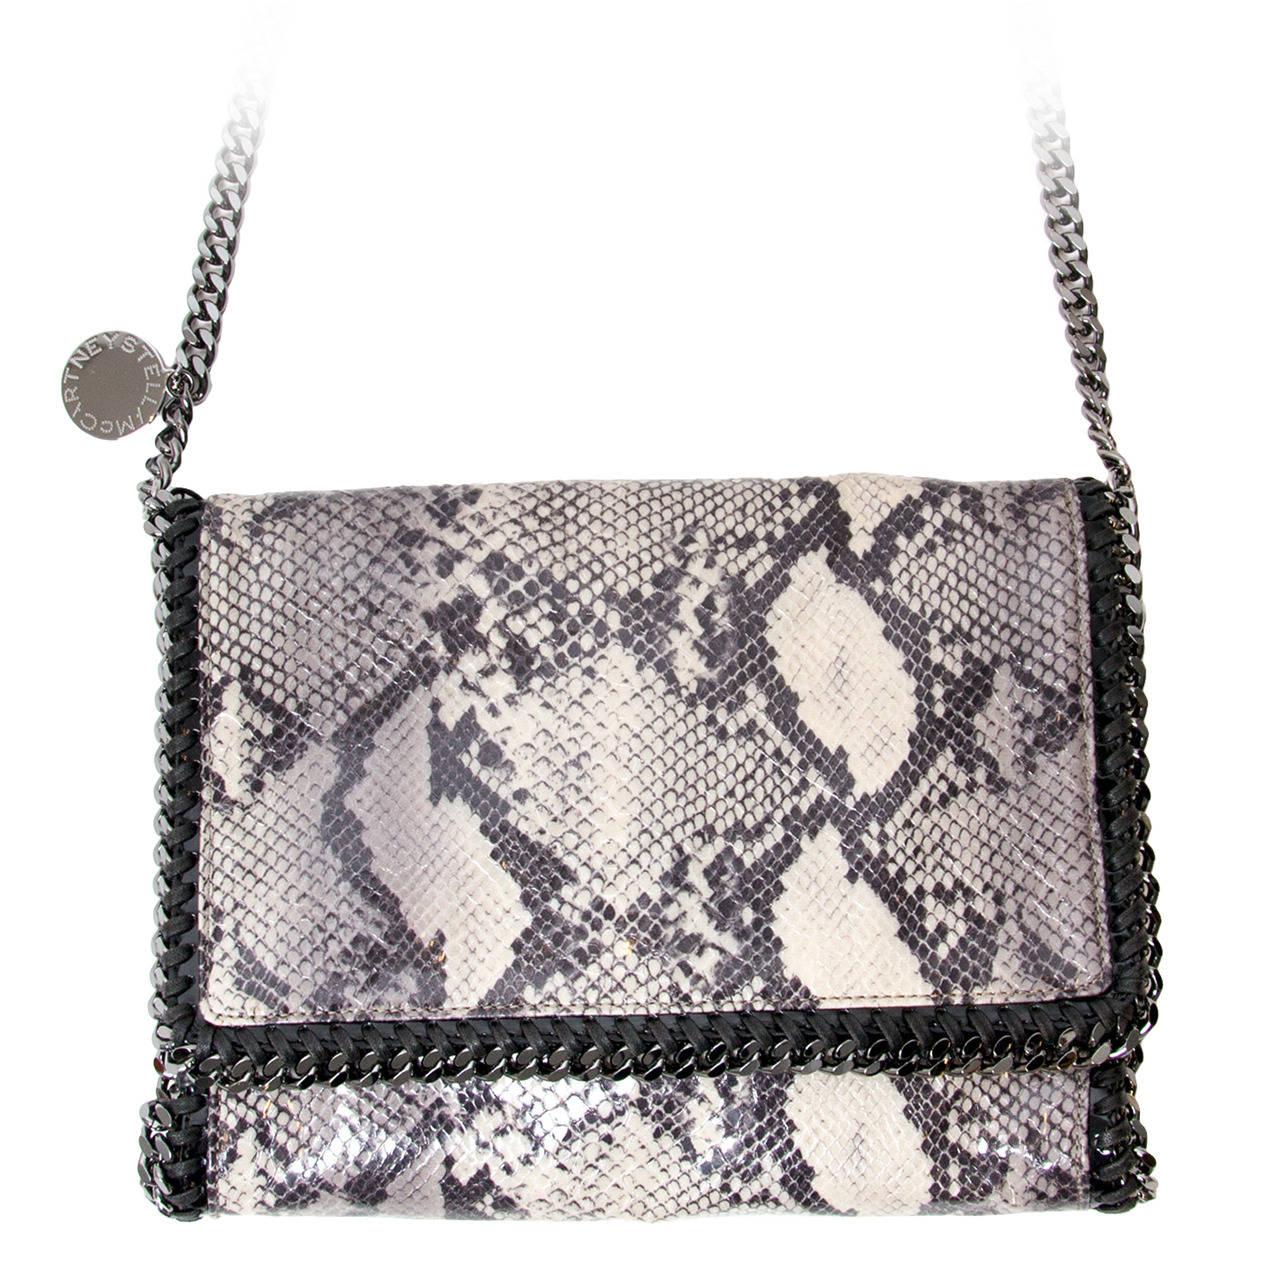 bba0f9bb80ff Stella McCartney Falabella Shoulder Bag Eco Python For Sale. Faux snakeskin  leather ...